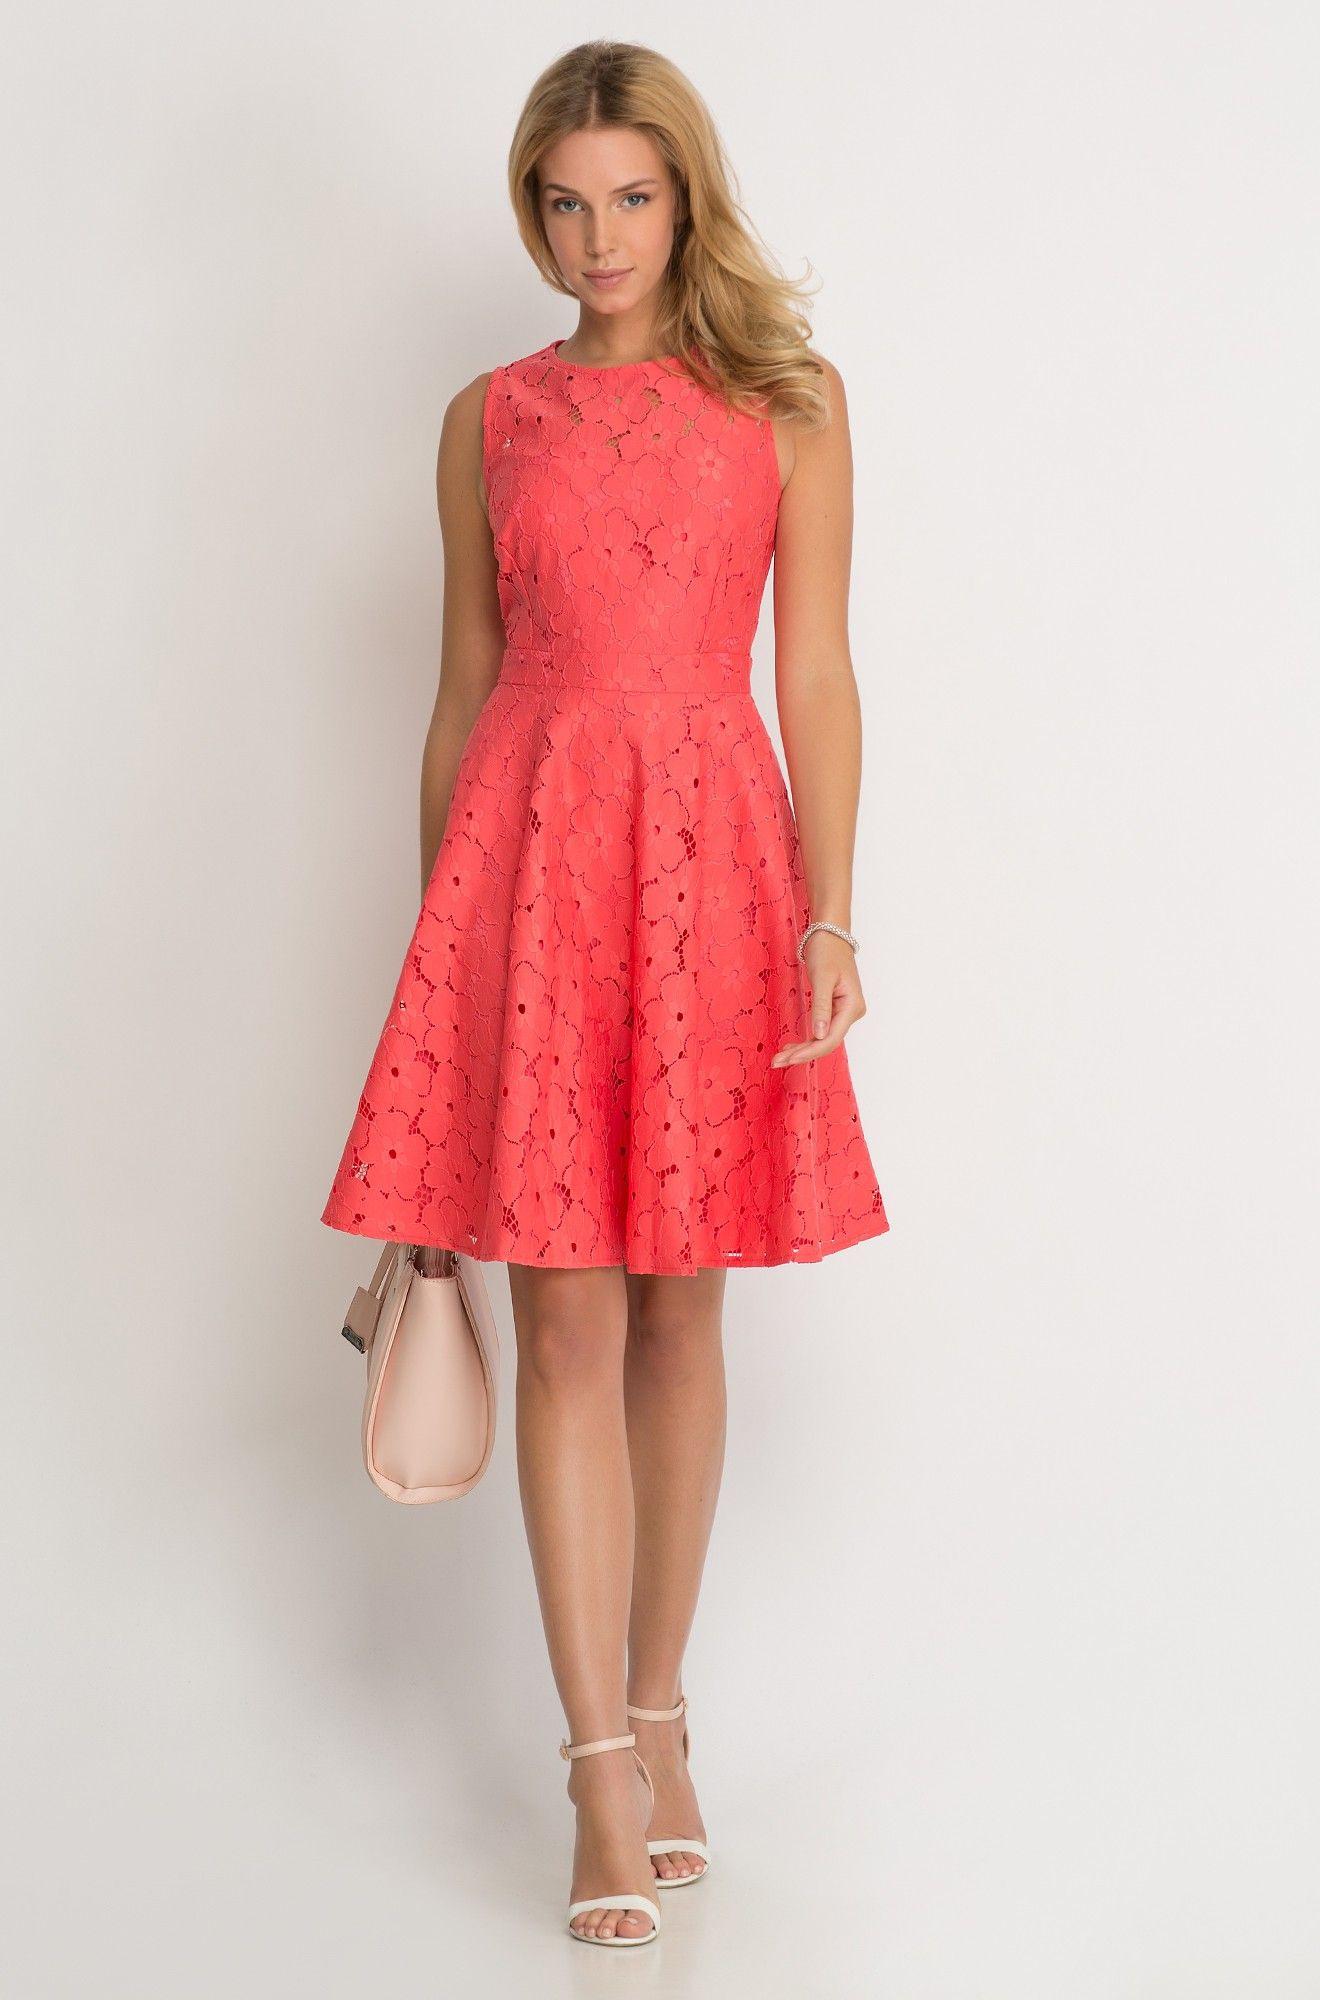 Designer Genial Orsay Abend Kleid Ärmel10 Elegant Orsay Abend Kleid Ärmel